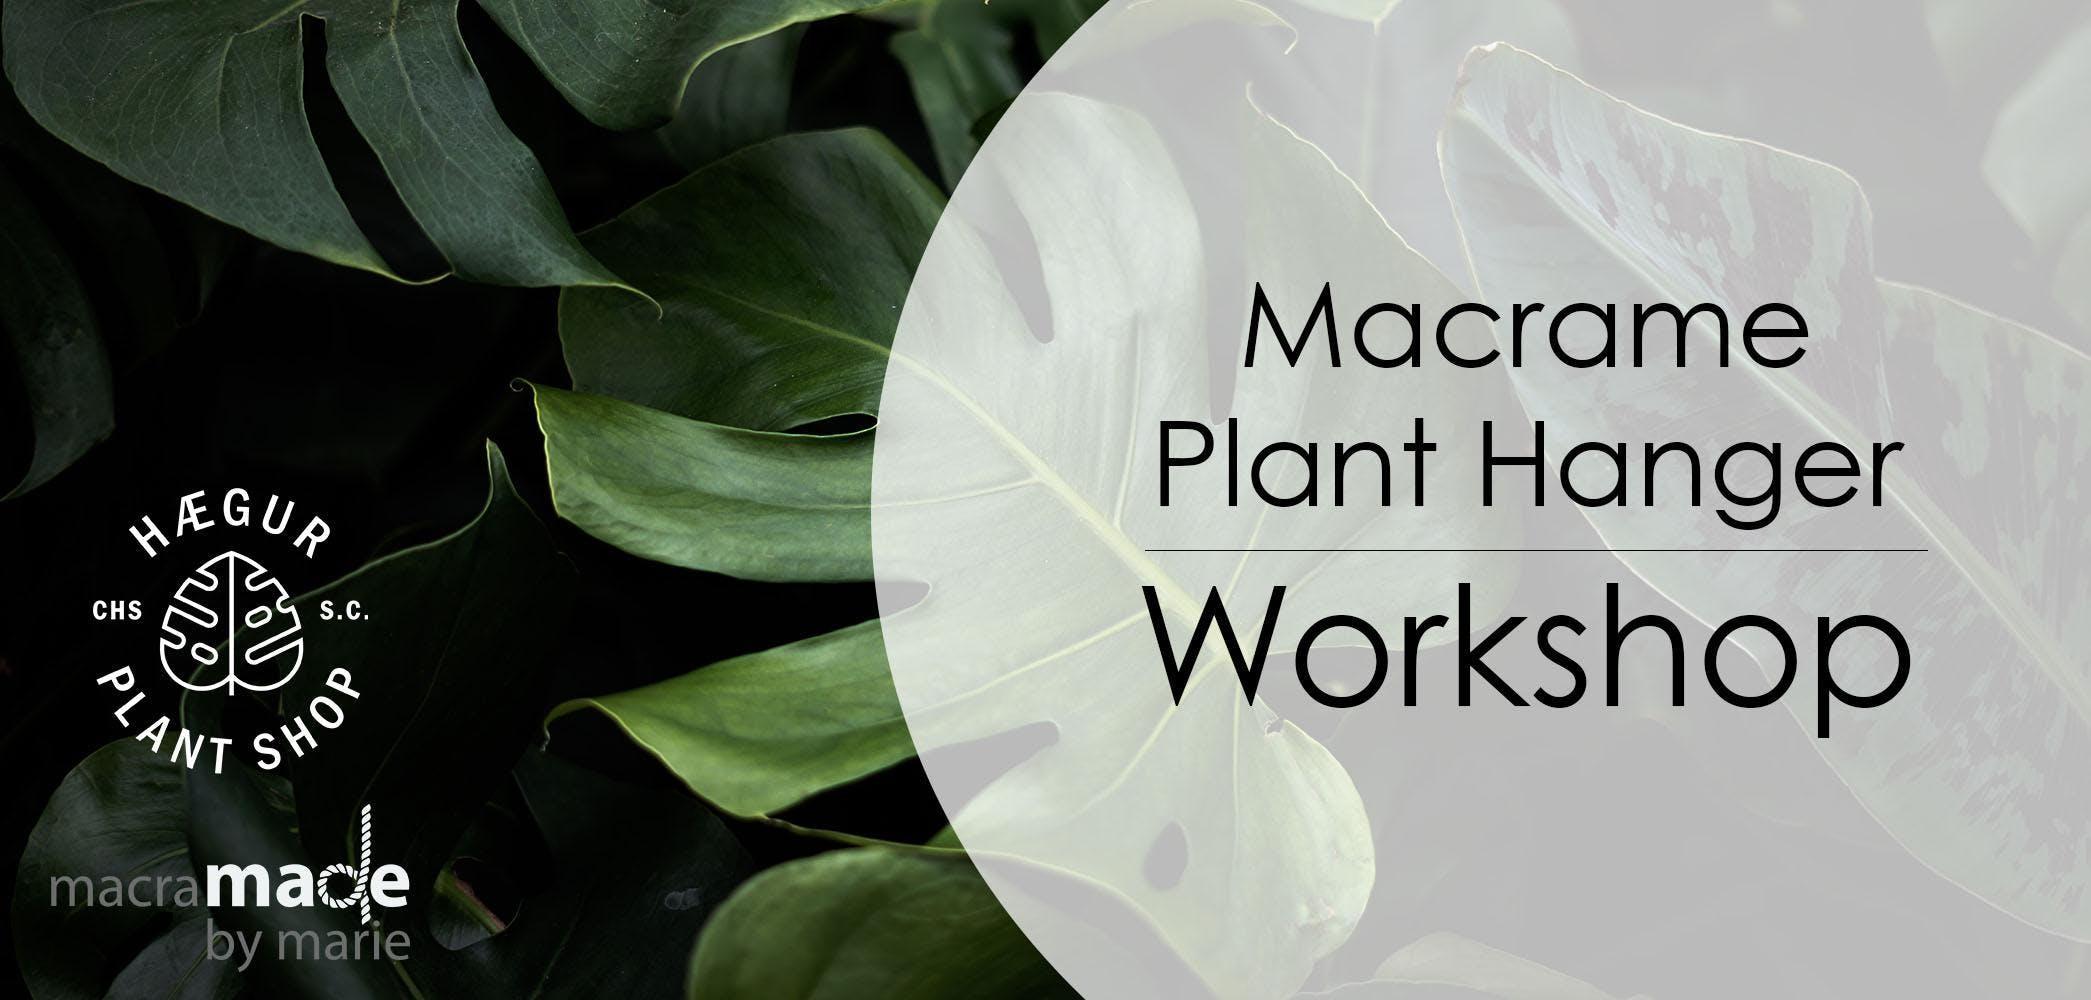 Macrame Plant Hanger Workshop @ Haegur Plant